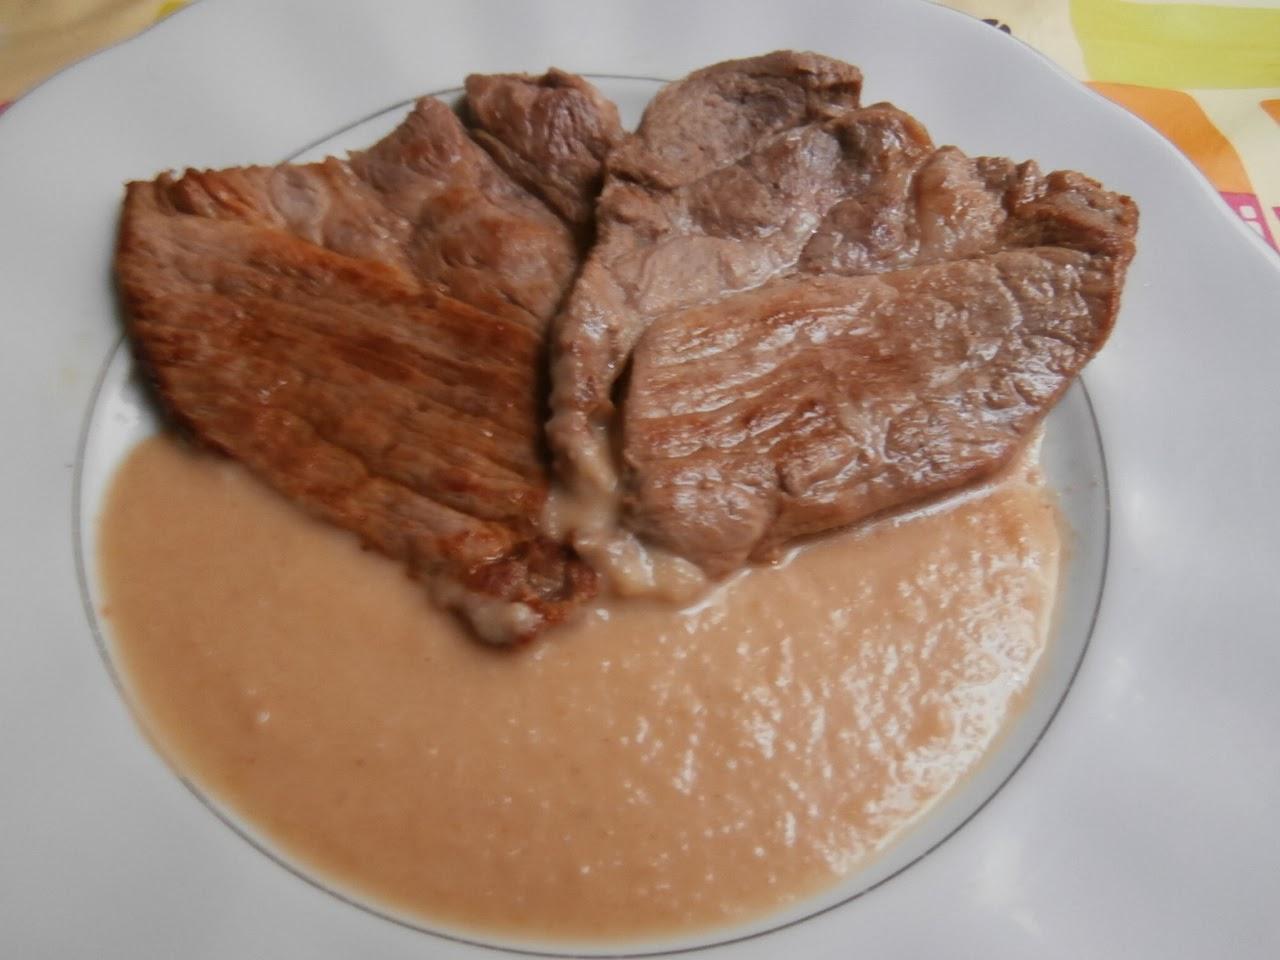 Cocina conchi filetes de cerdo con salsa de membrillo - Filetes de carne en salsa ...